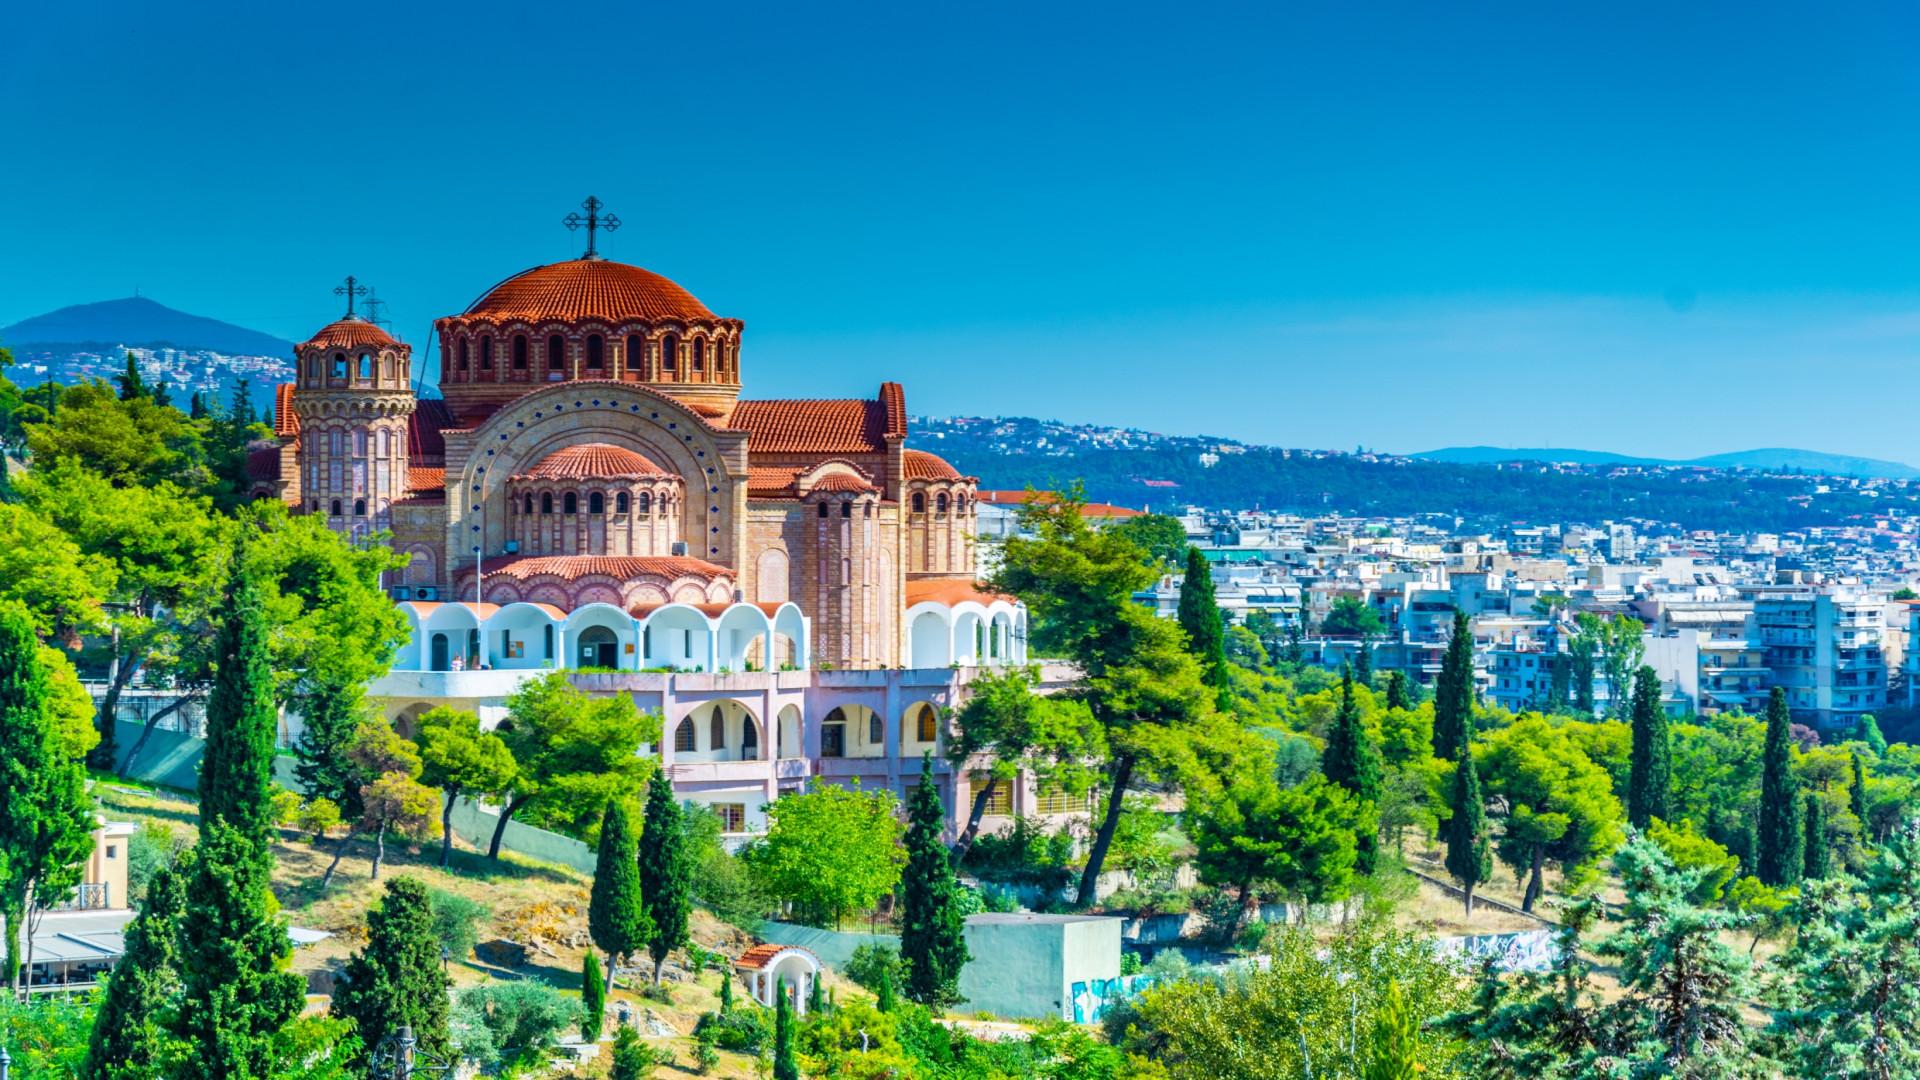 Saint Paul kathedraal in Thessaloniki, Griekenland